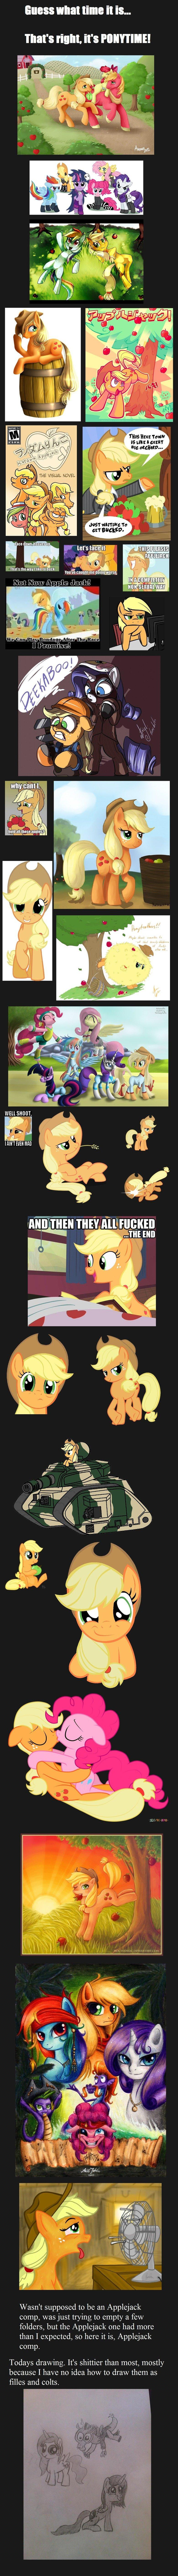 Ponycomp 101. Ponycomp 100: /channel/ponytime/Ponycomp+100/pLhTGcY/ DOWNLOAD LINK: www.mediafire.com/?a7jp451yzez5t.. I like this one, My Little Pony ponies ponytime